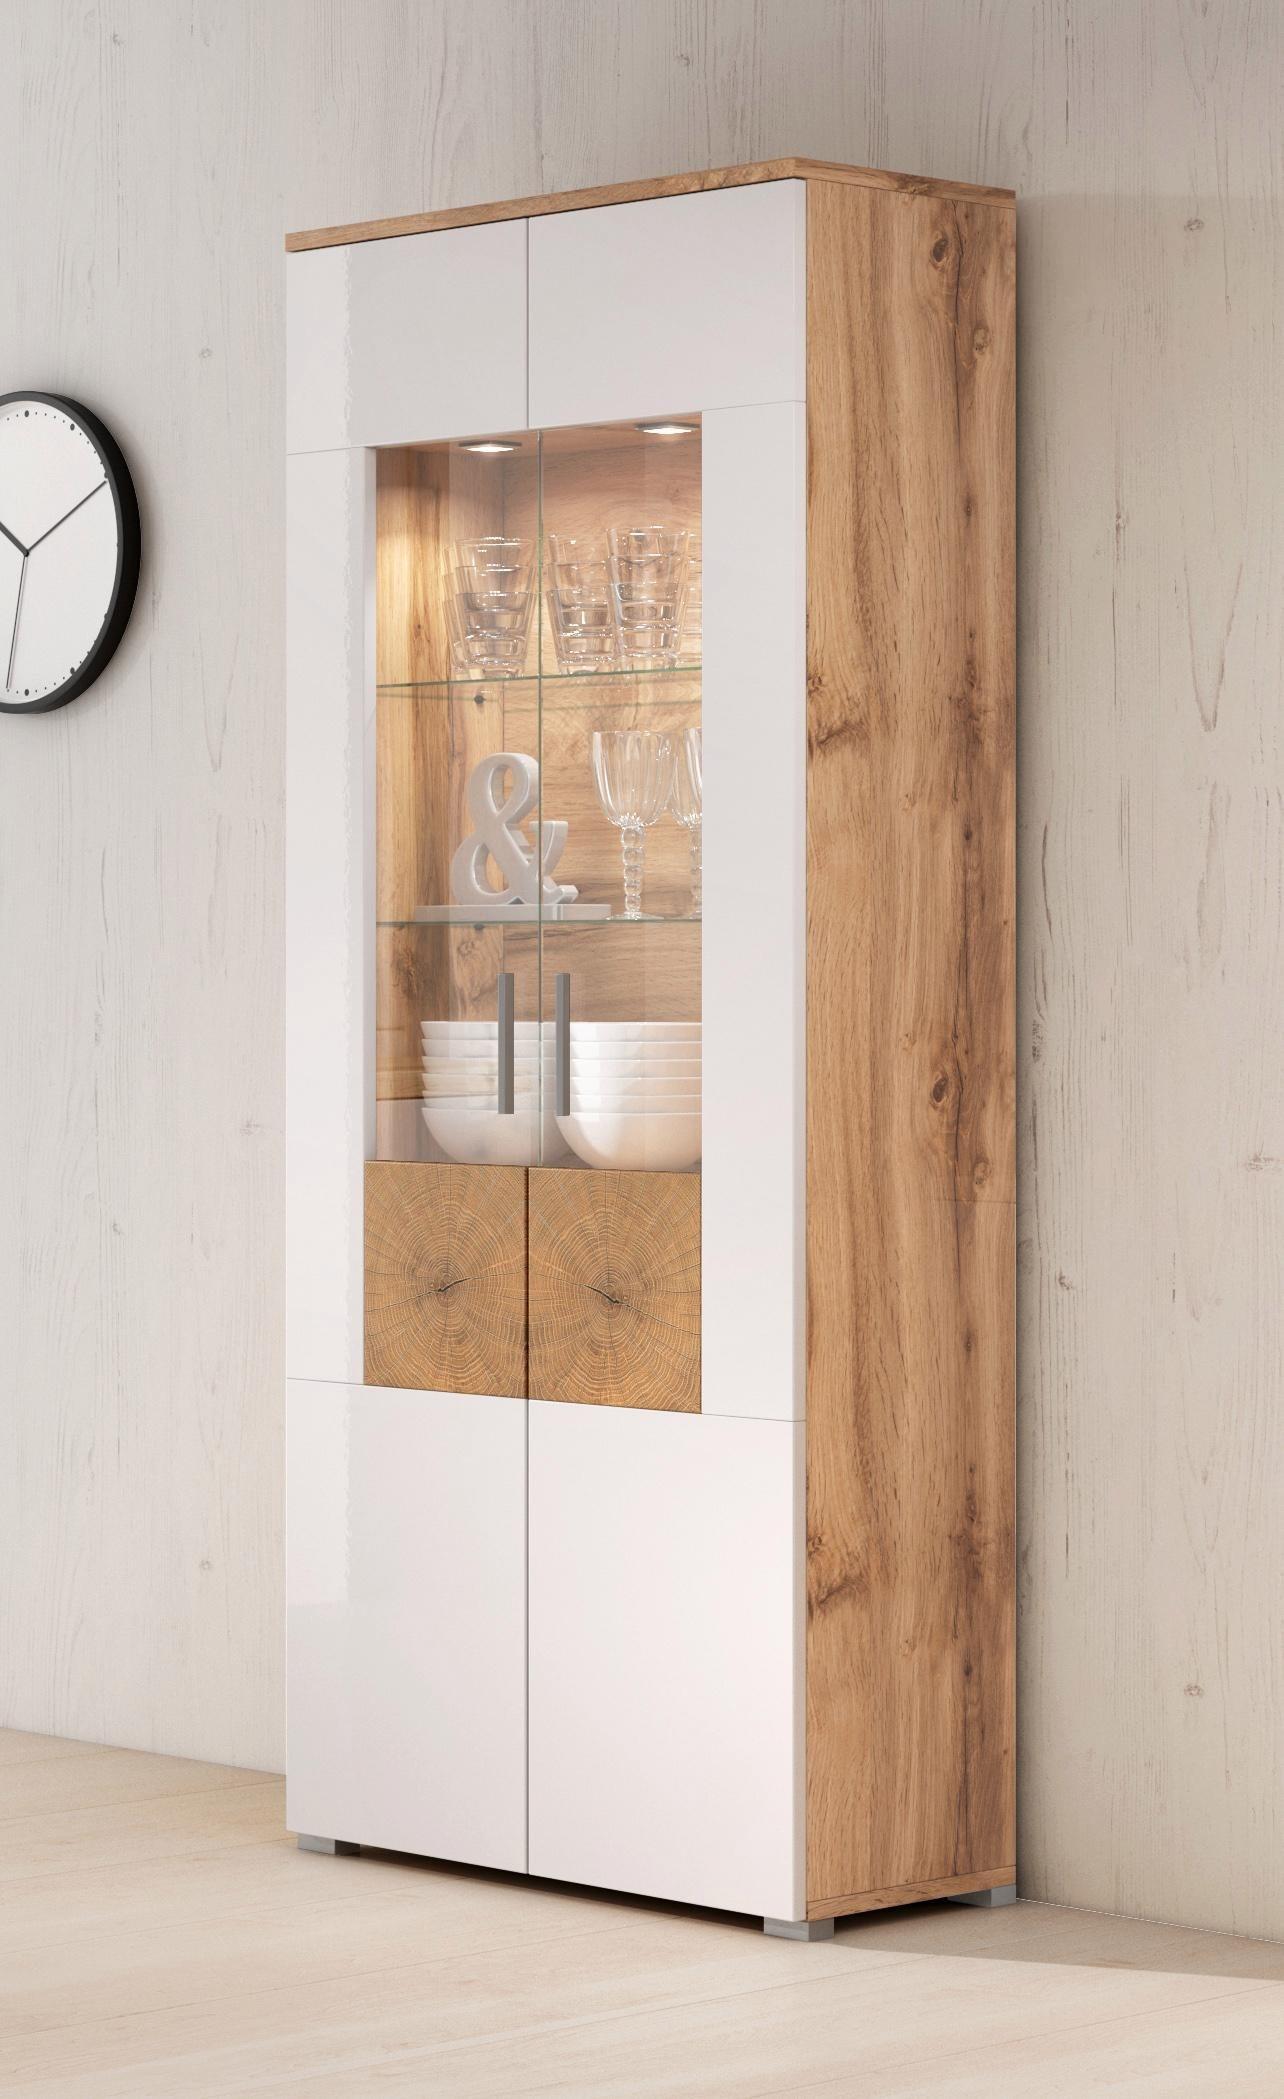 48 sparen vitrine wobona nur 169 99 cherry m bel. Black Bedroom Furniture Sets. Home Design Ideas